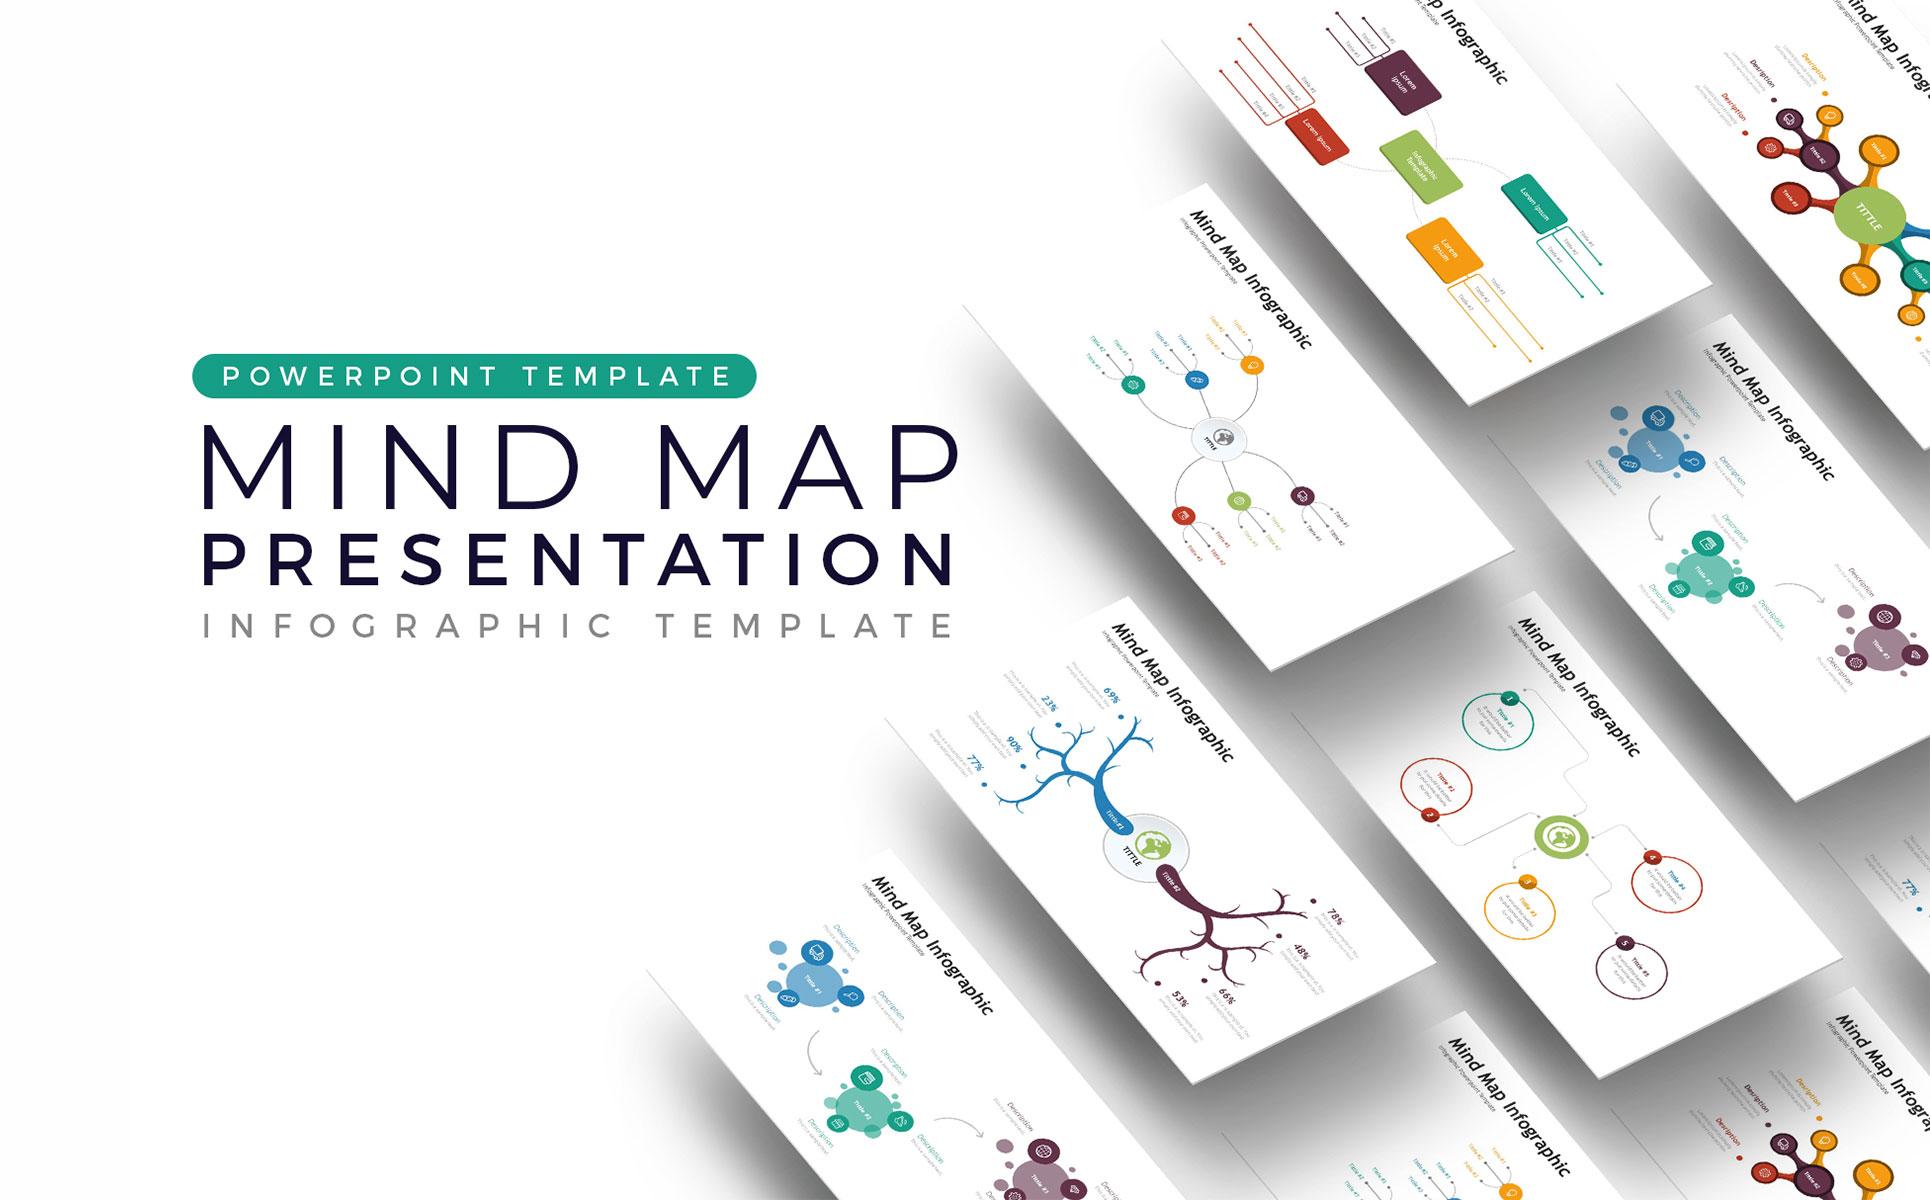 Mindmap Presentation - Infographic PowerPoint Template